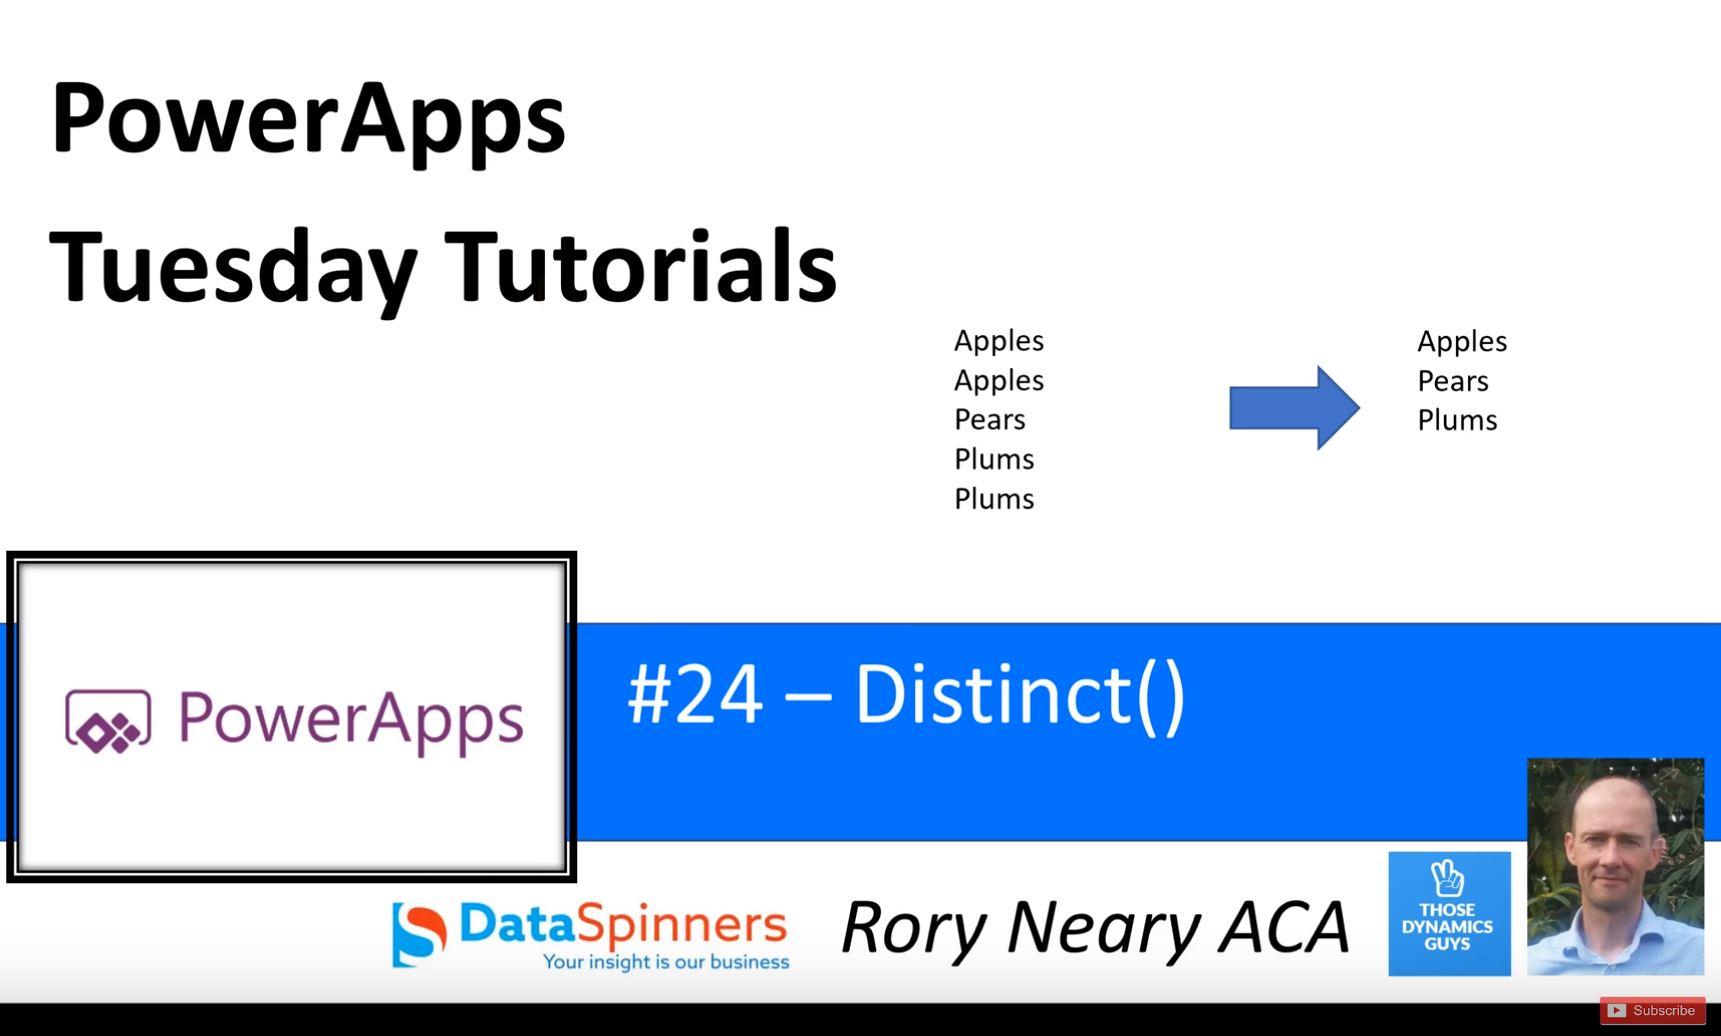 PowerApps Tuesday Tutorials #24 Distinct